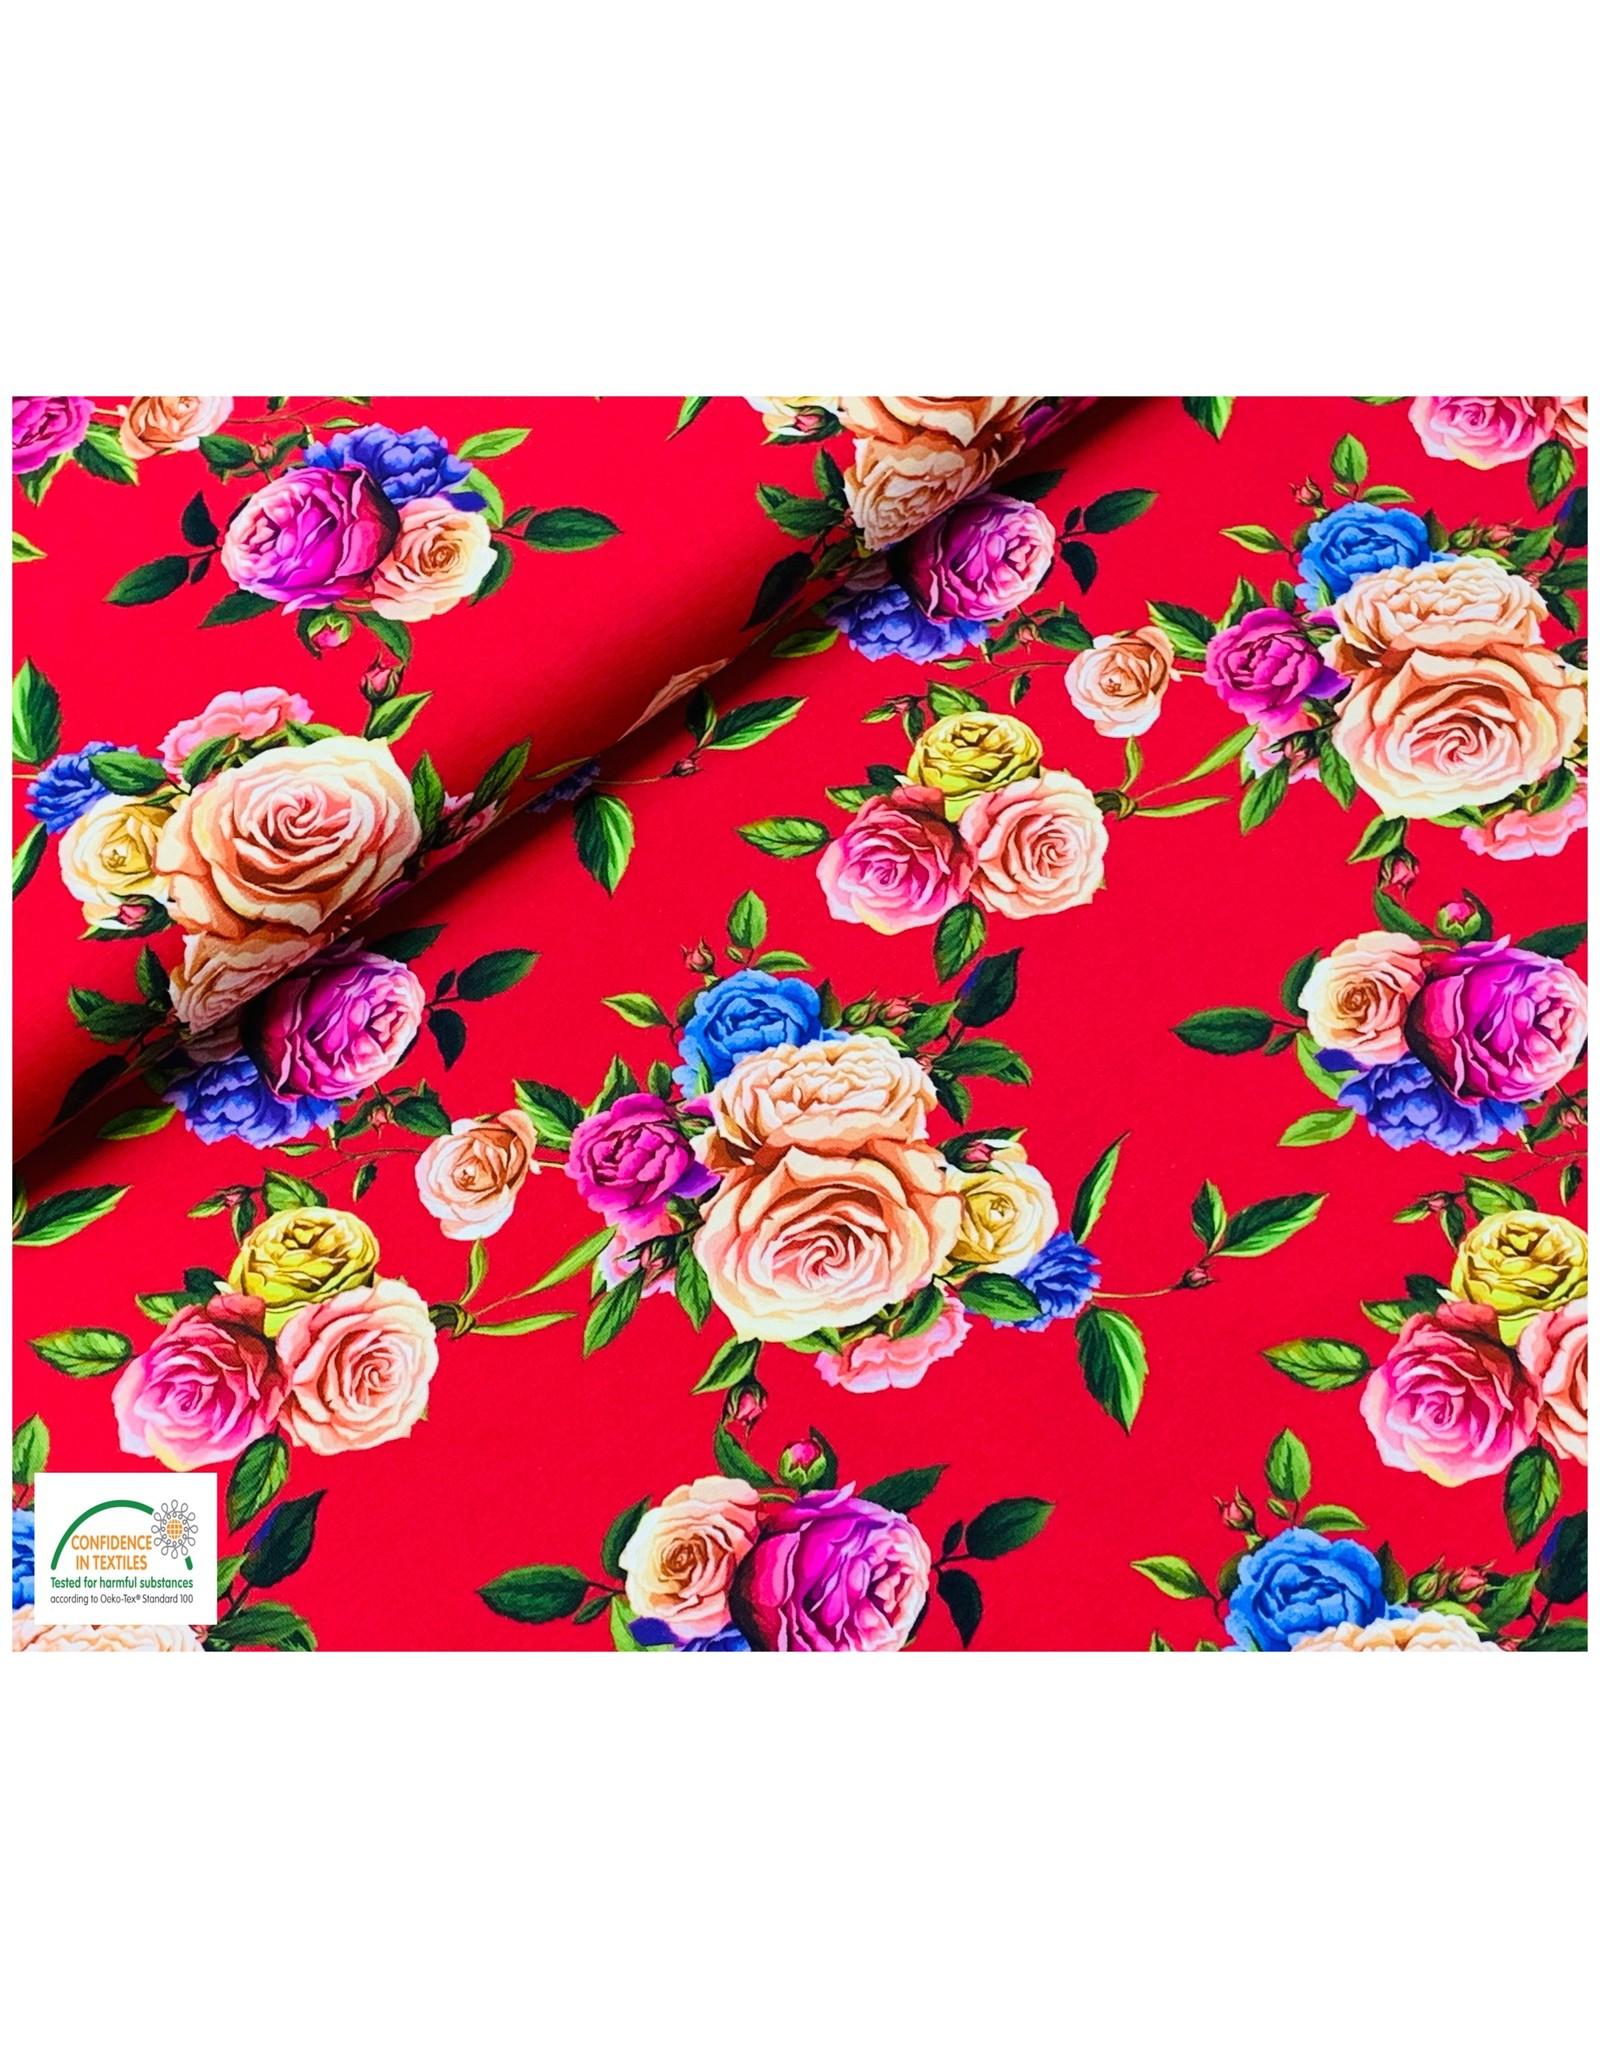 Megan Blue Fabrics Megan Blue tricot Flowers red